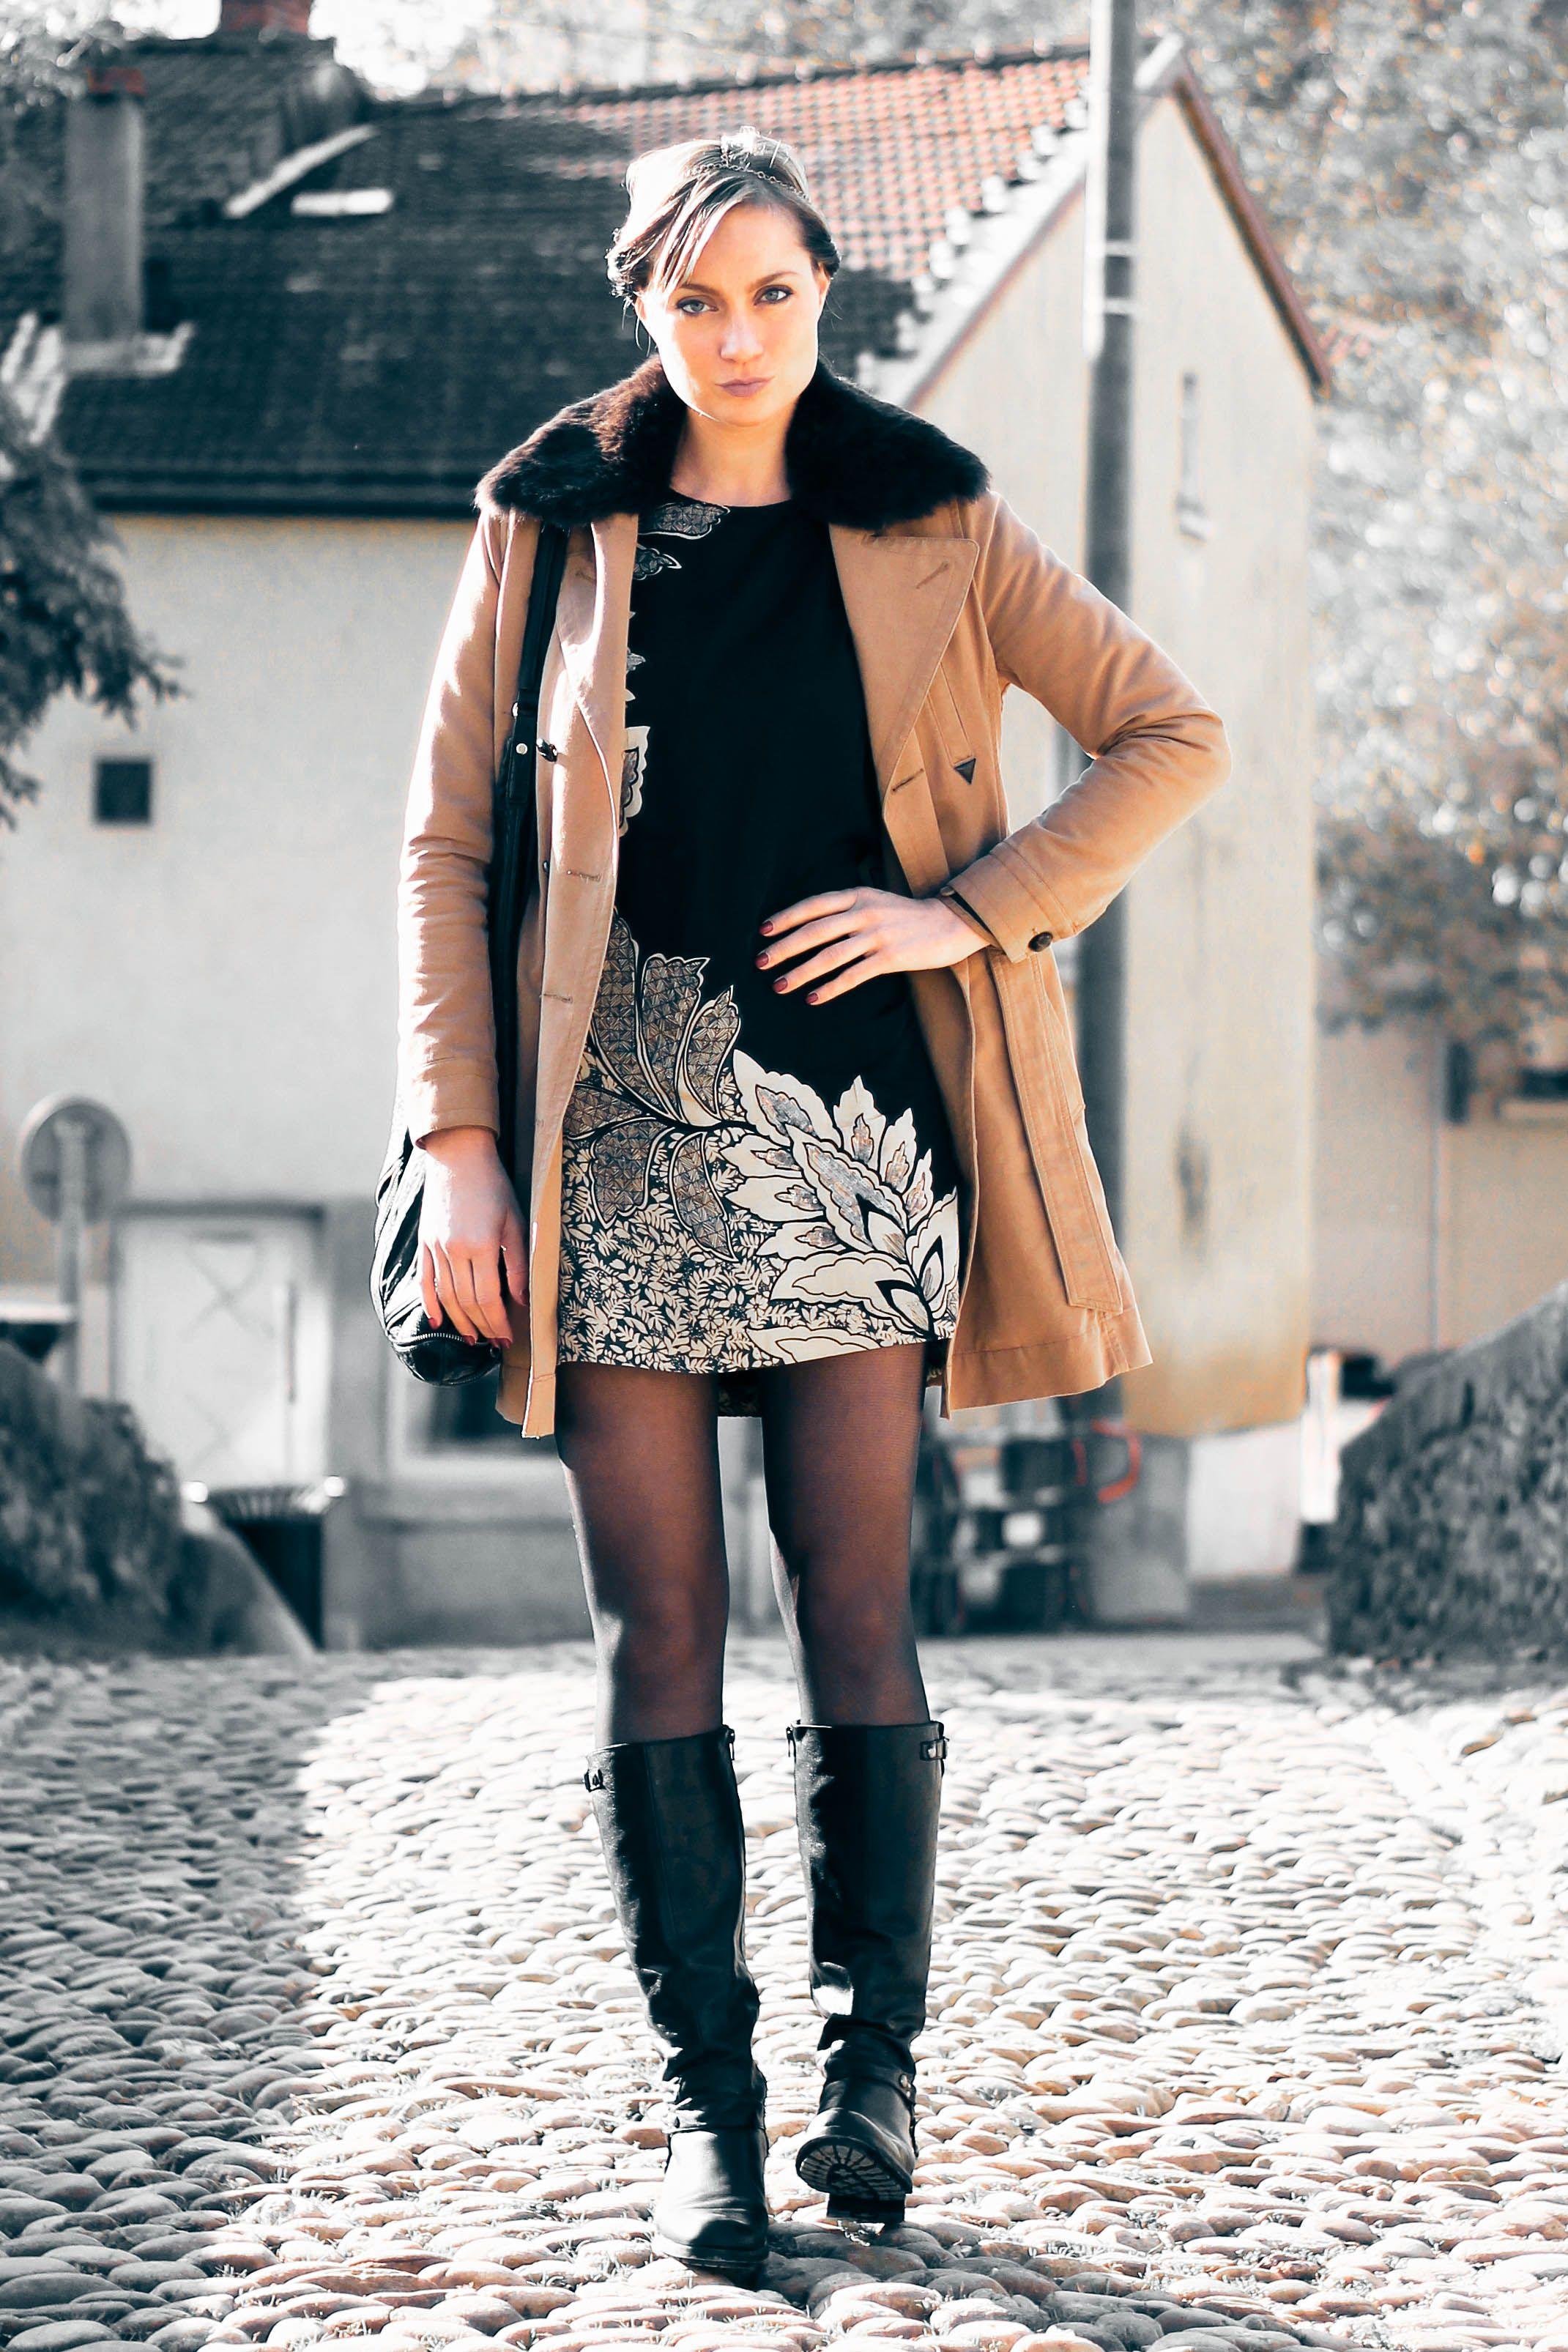 Artlex Streetlook Streetstyle Fashion Bloggeur Fashionblog Fashionblogger Outfitoftheday Ootd Blog Mode Artlex Lyon Blogueu Look Style Bottes Noires Tenue Mode